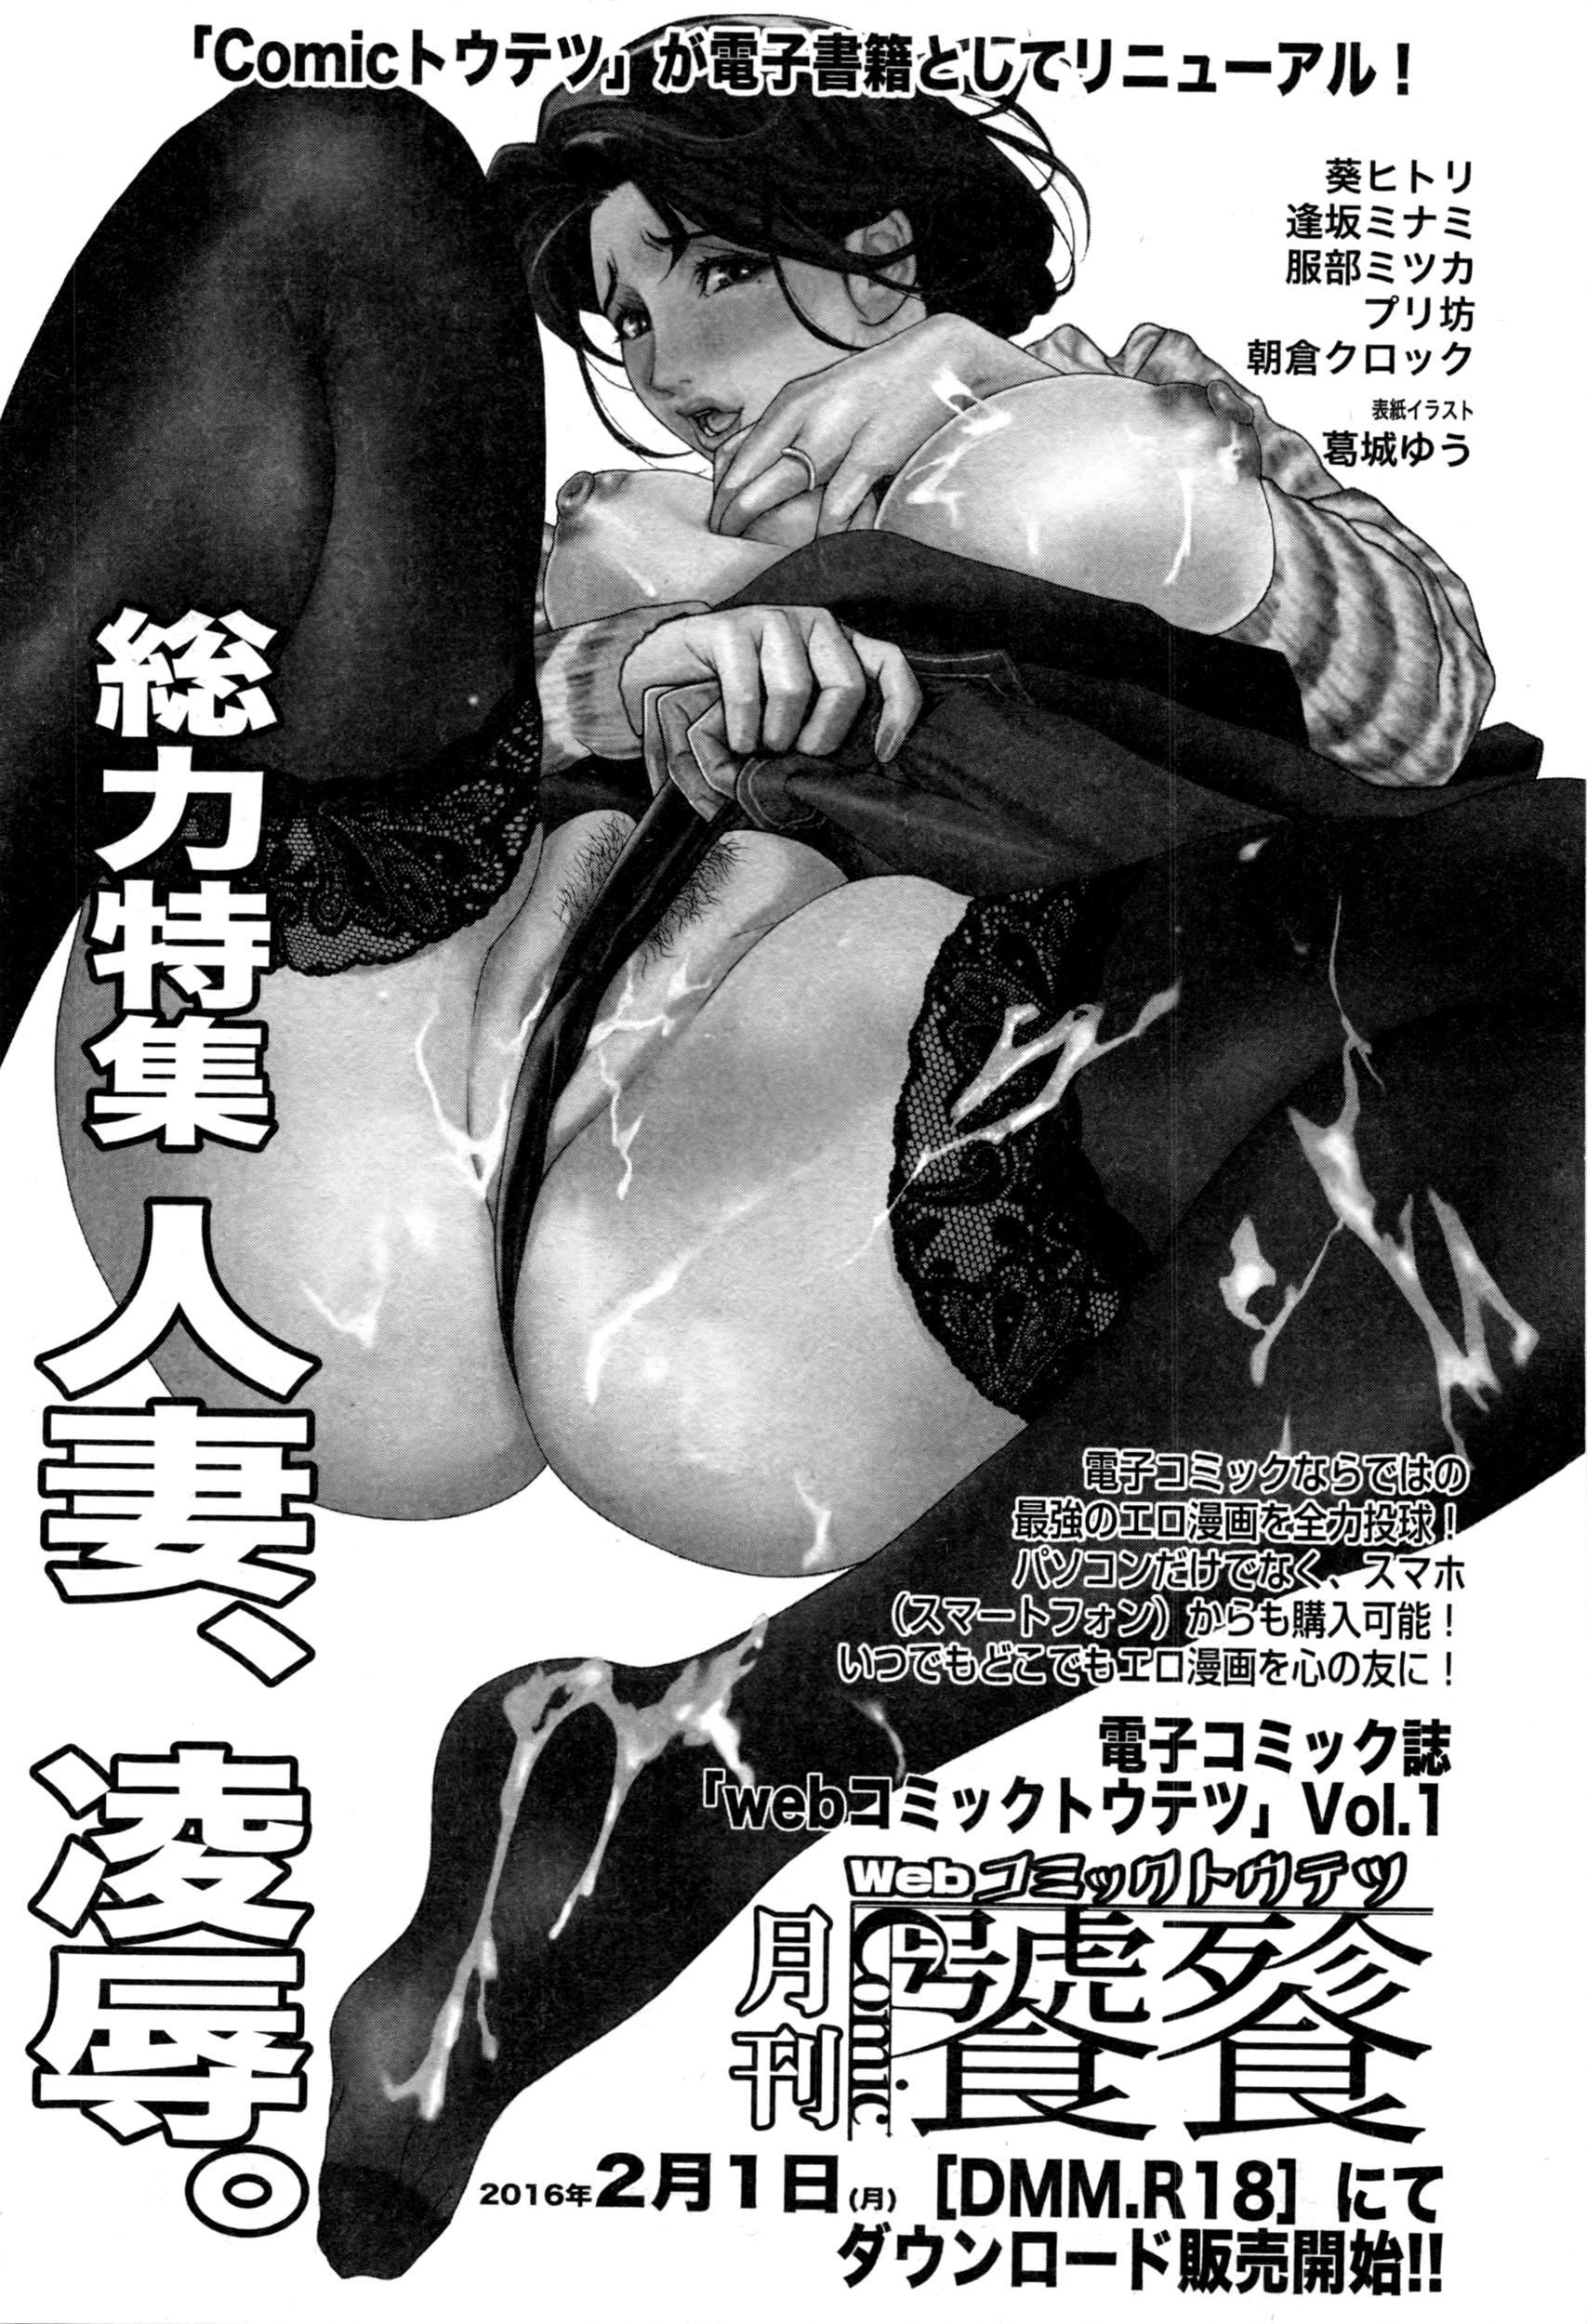 Comic JSCK Vol.3 2016-03 274